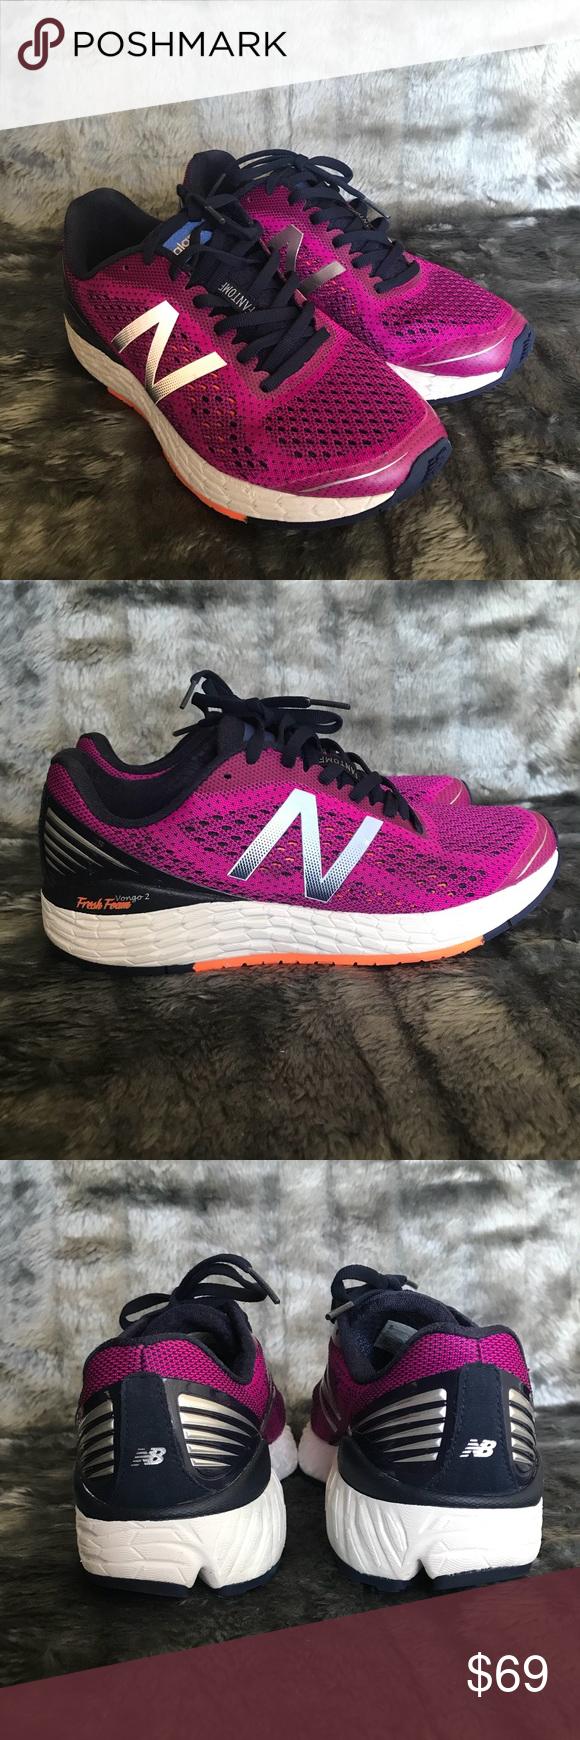 New Balance Fresh Foam Vongo V2 Running Shoe New Balance Fresh Foam Stability Running Shoes Running Shoes